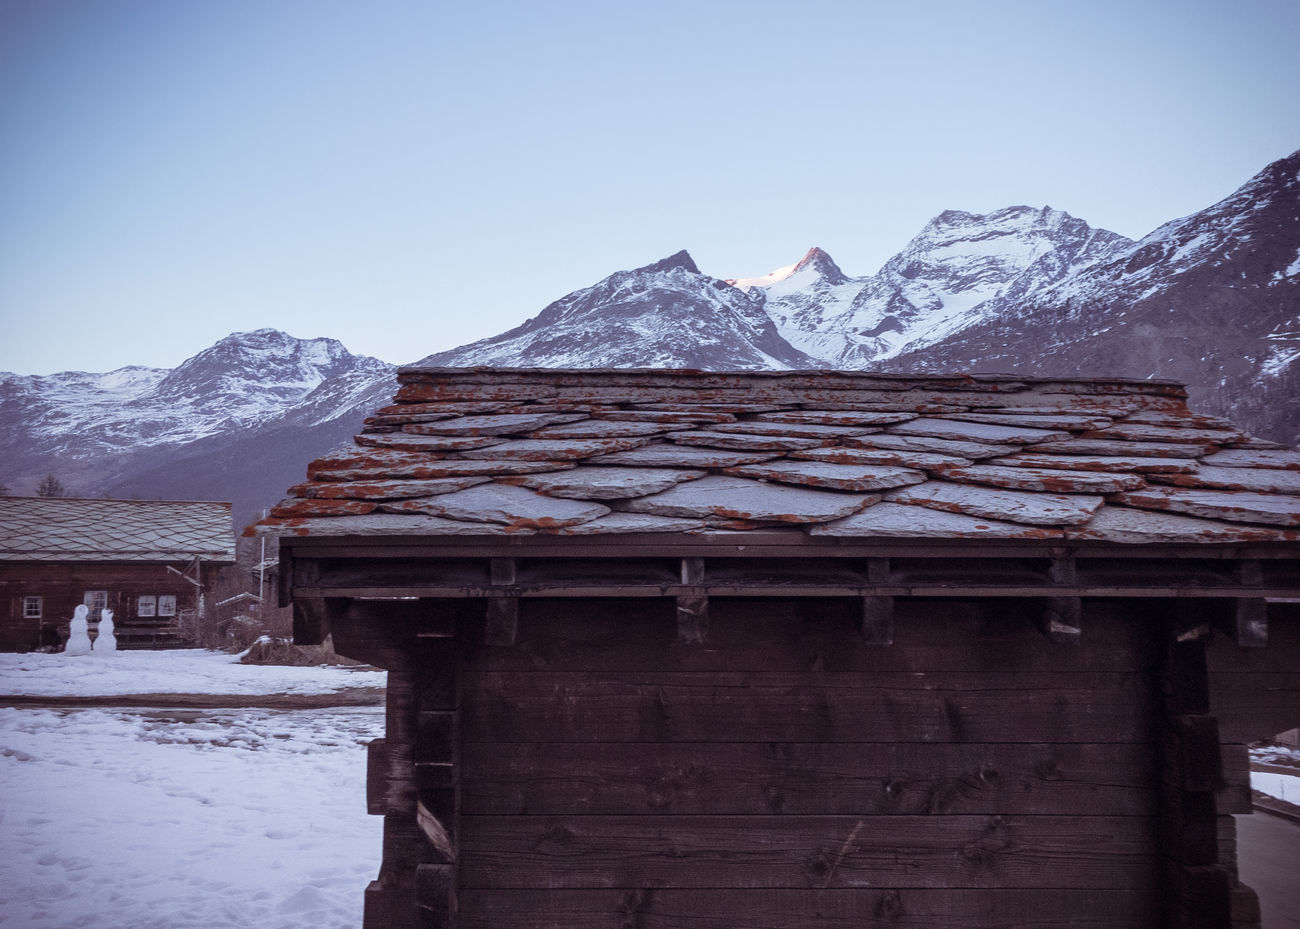 Agricultural Building Barn Lowlight Motion Blur Mountain Range Snow Snowman Switzerland Alps Valais Vignette